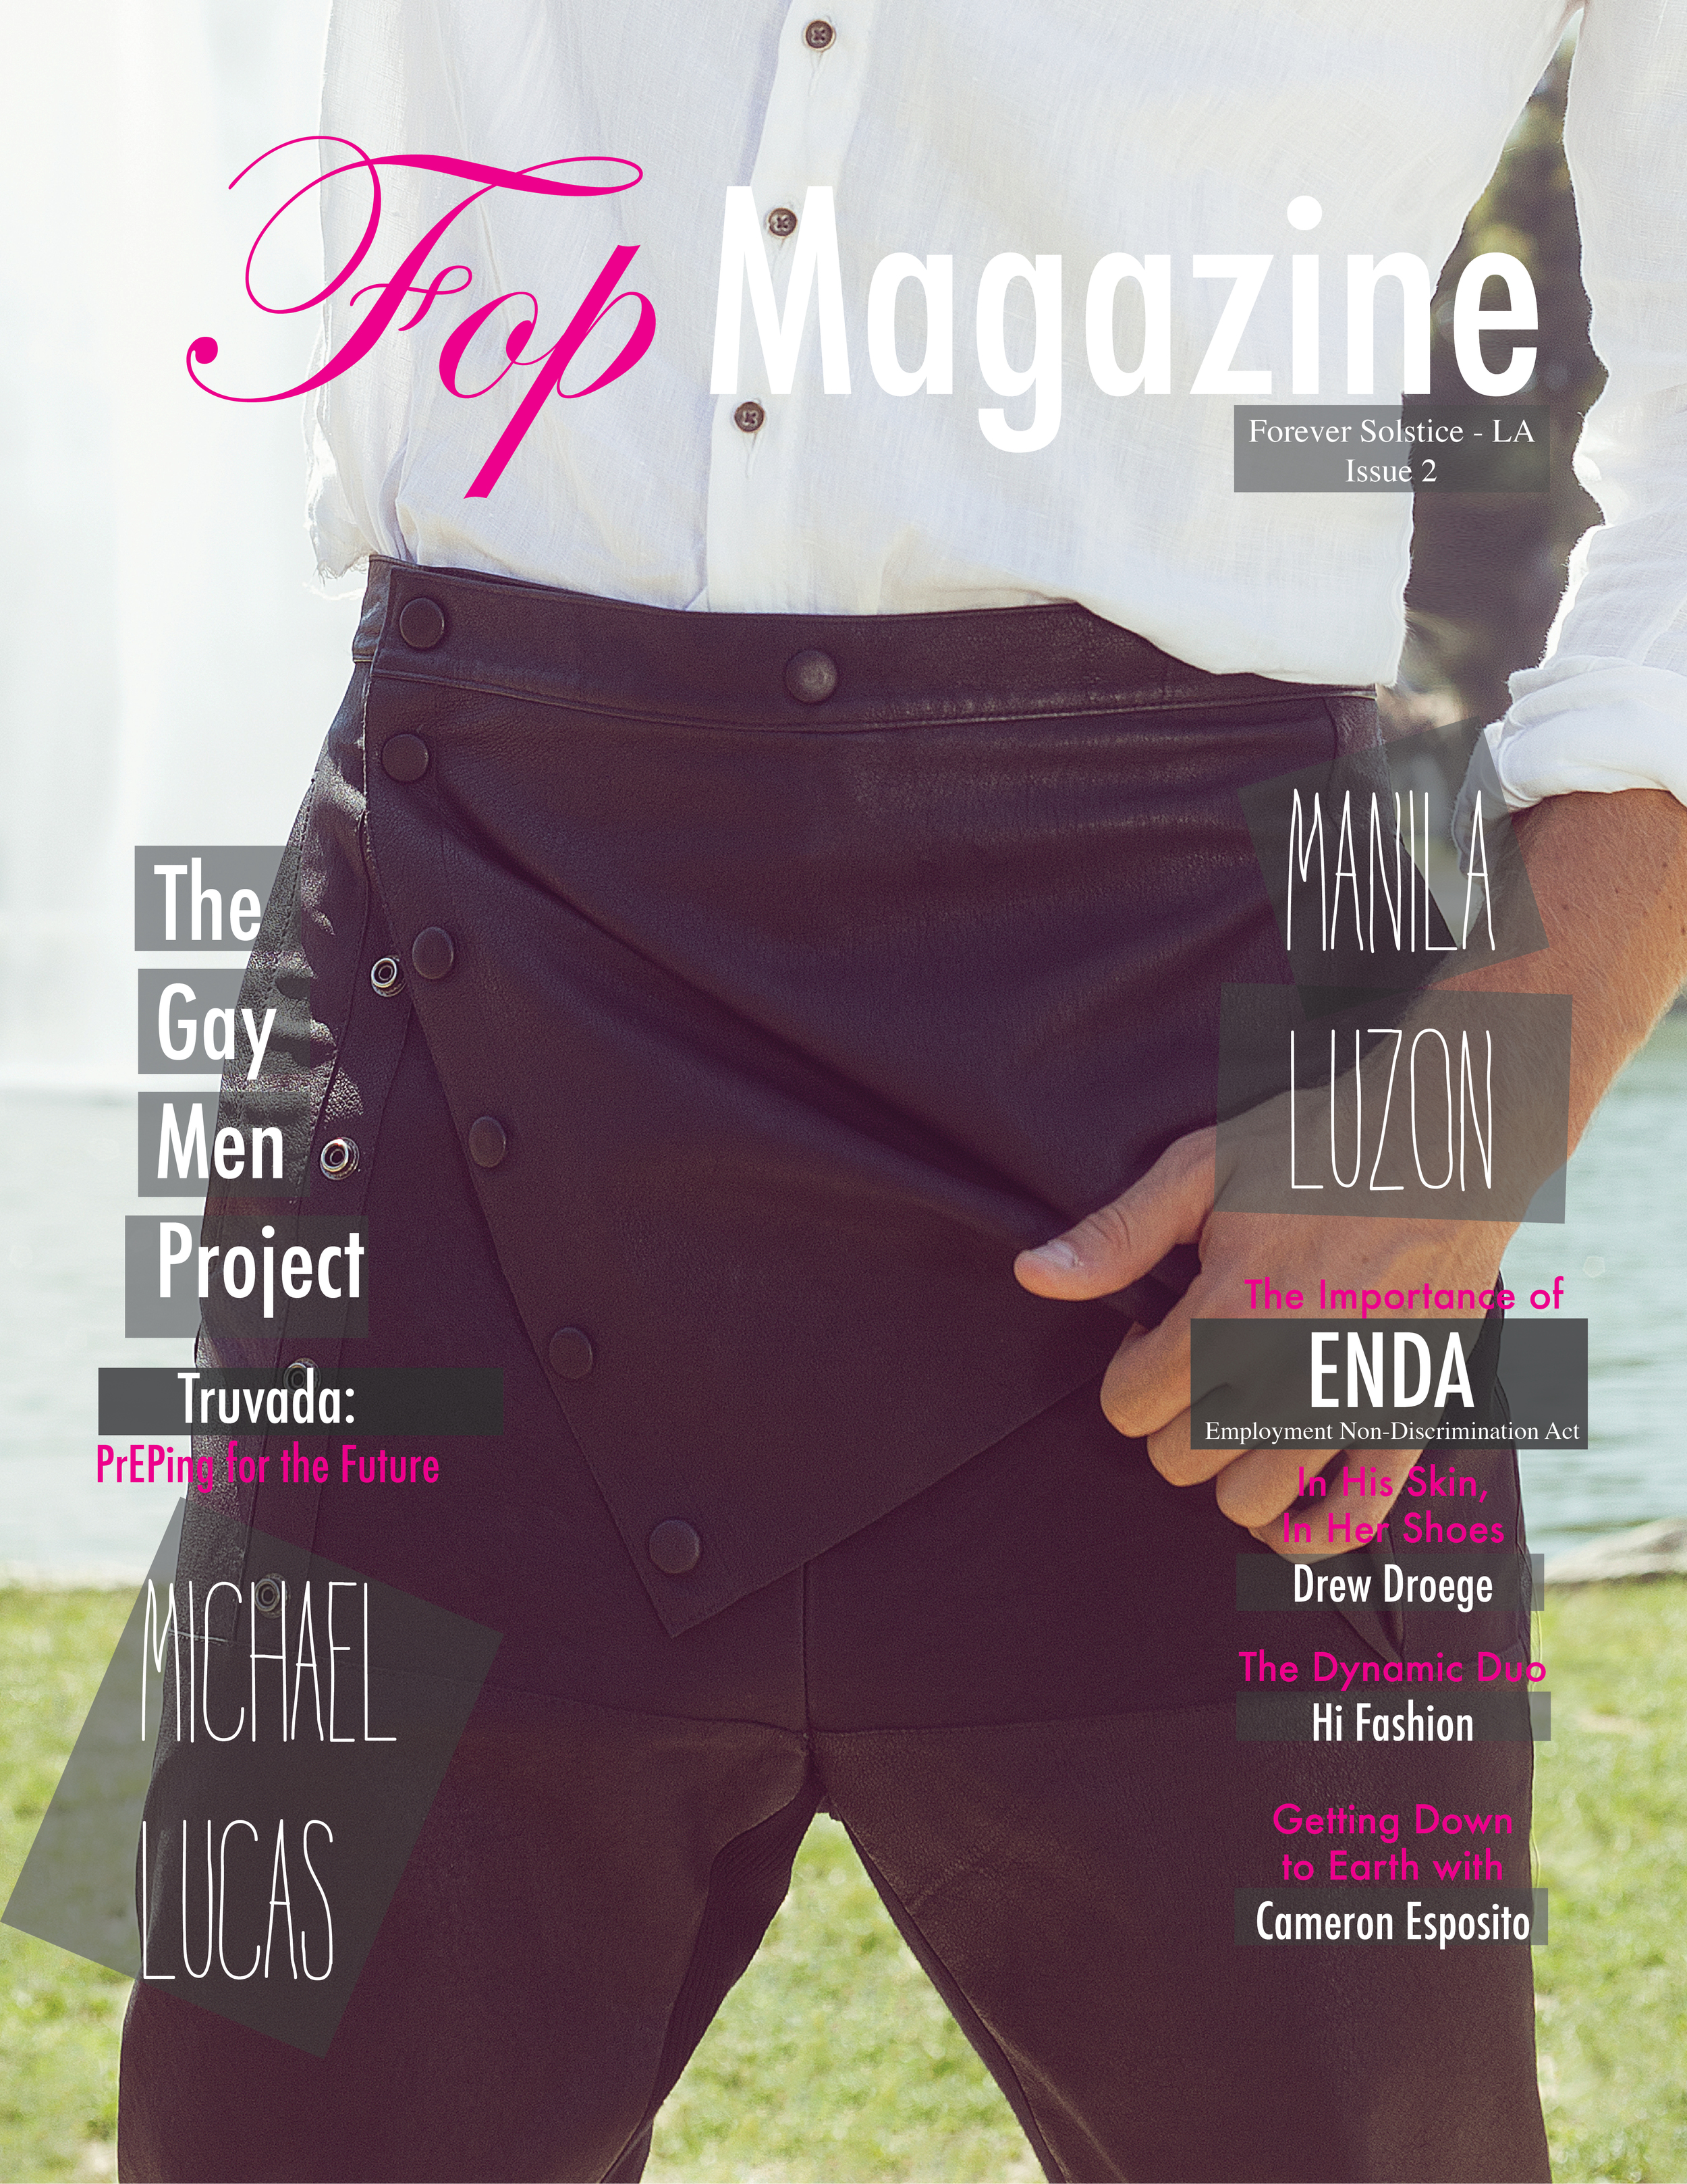 Fop Magazine Forever Solstice29.jpg